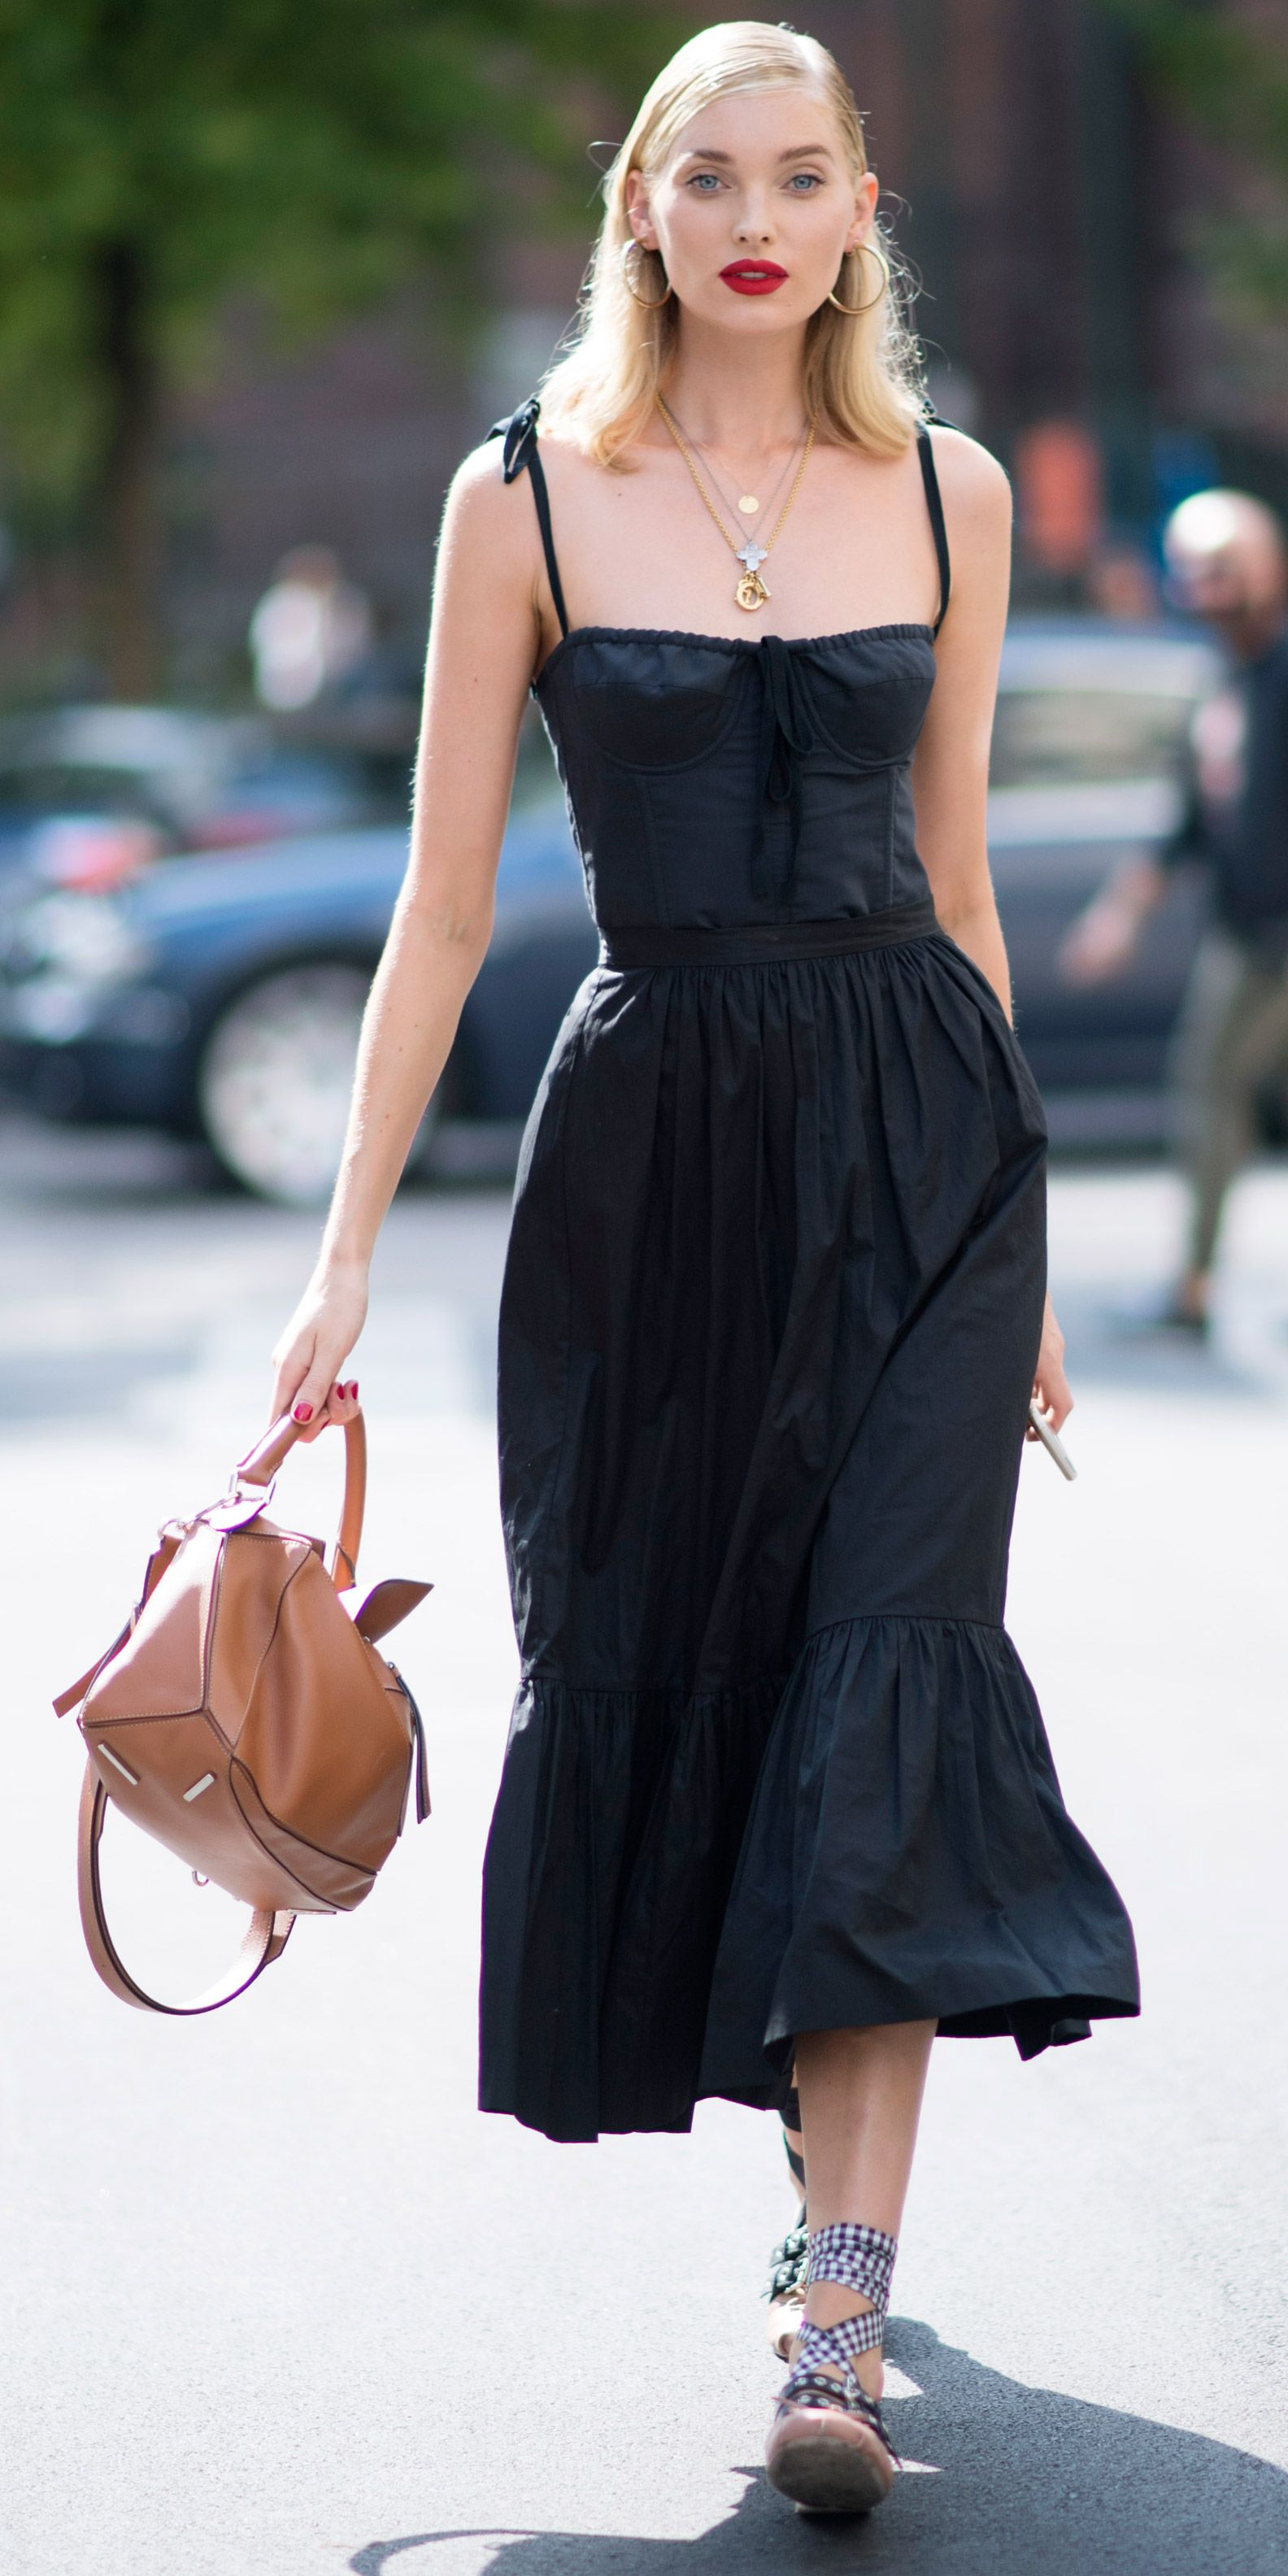 elle việt nam phong cách thời trang elsa hosk 9